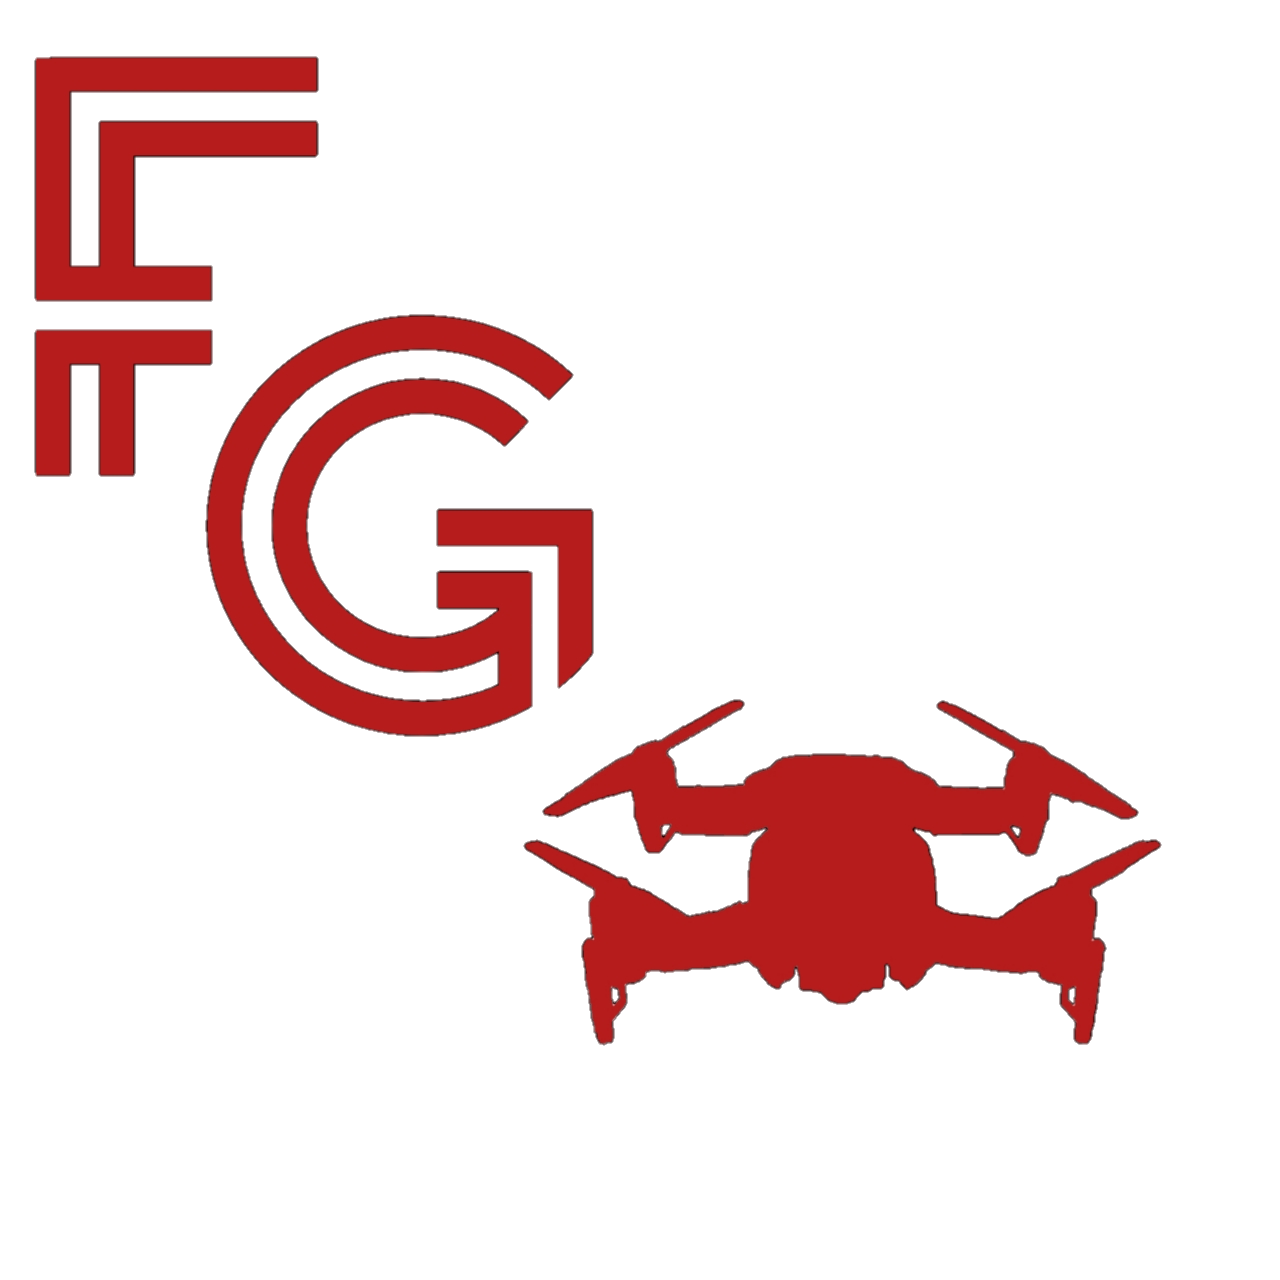 logo snimanje iz vaduha